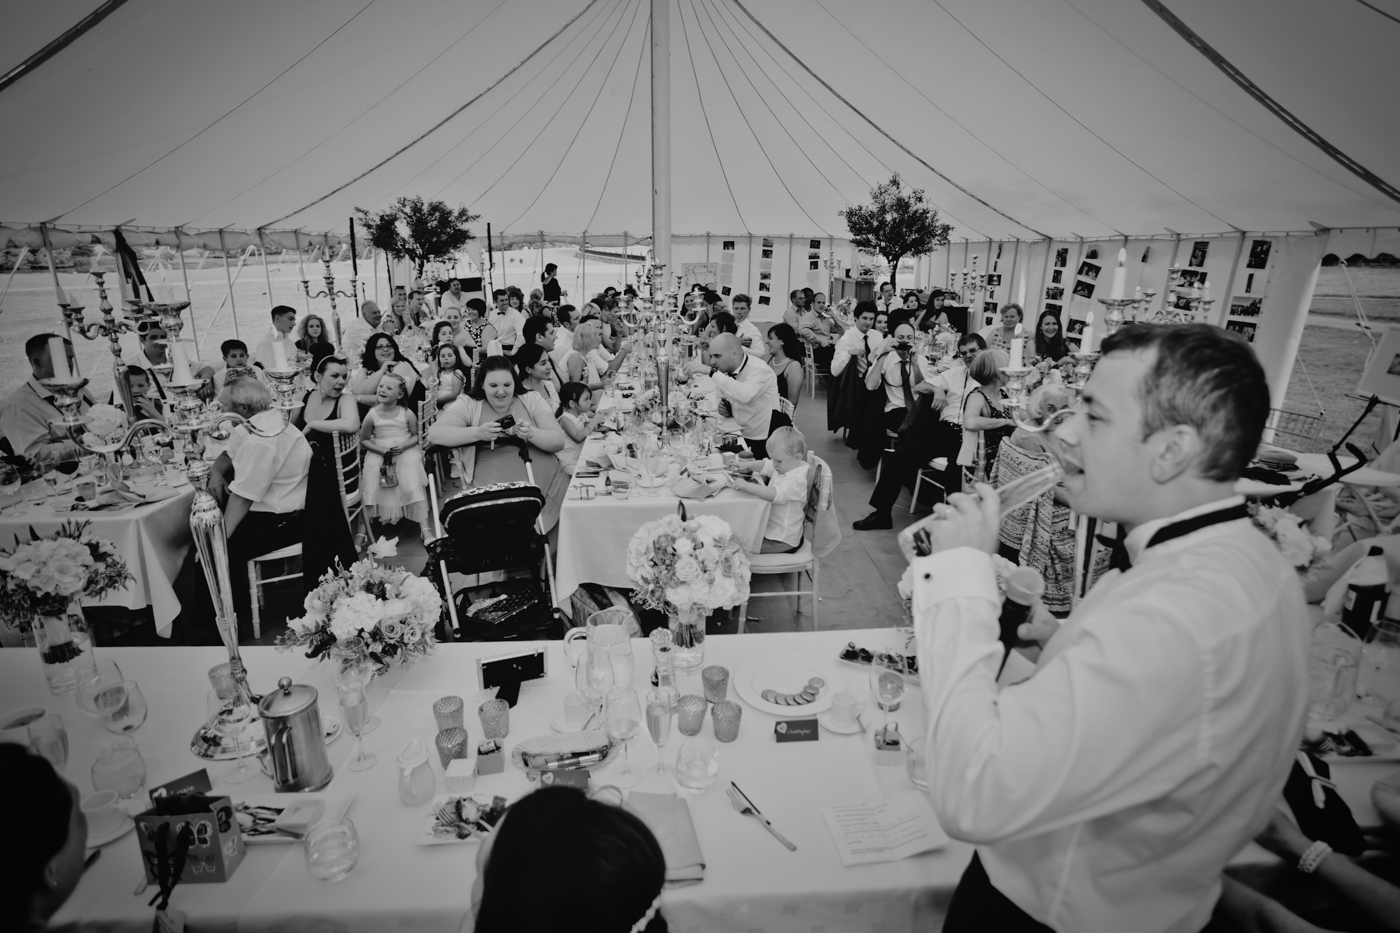 157 - Abi and Chris at Kedleston Hall - Wedding Photography by Mark Pugh www.markpugh.com - 0642.JPG